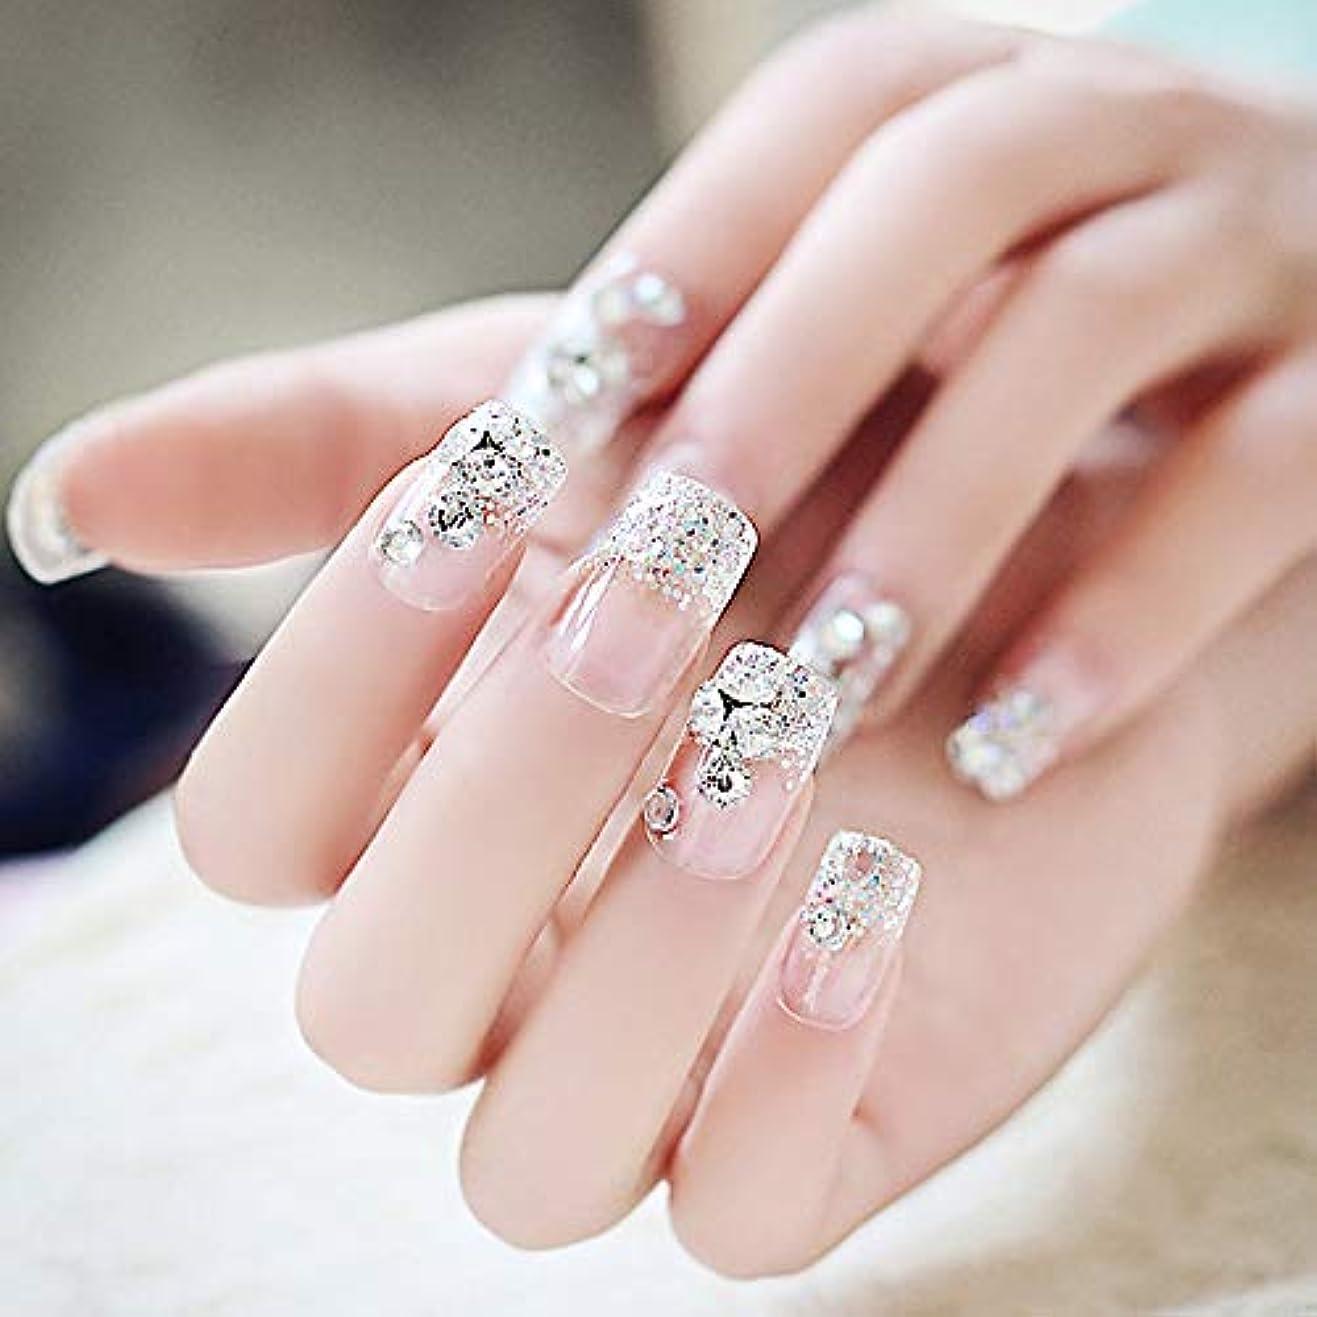 XUTXZKA ラインストーンの結婚式の偽の釘スクエアフルカバーを輝く透明ファッション偽の釘の花嫁